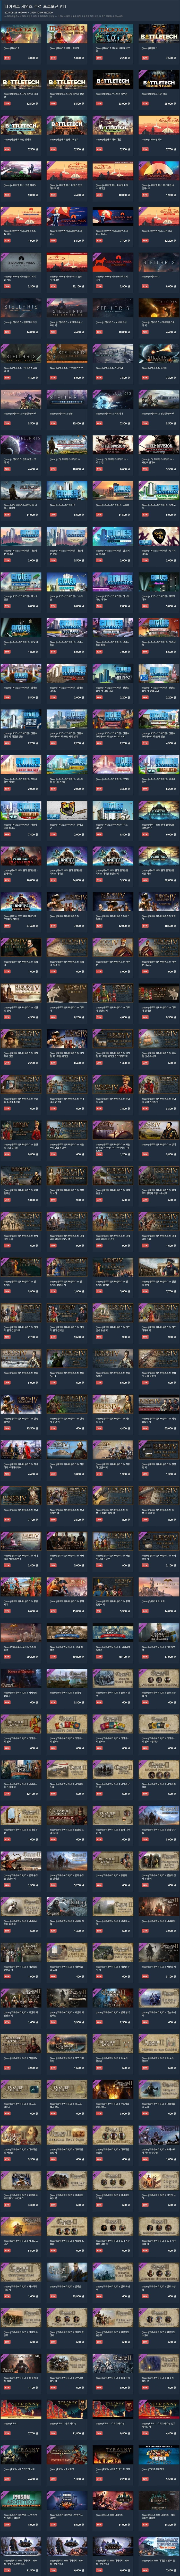 Screenshot_2020-09-25 다이렉트 게임즈 추석 프로모션 #11.jpg